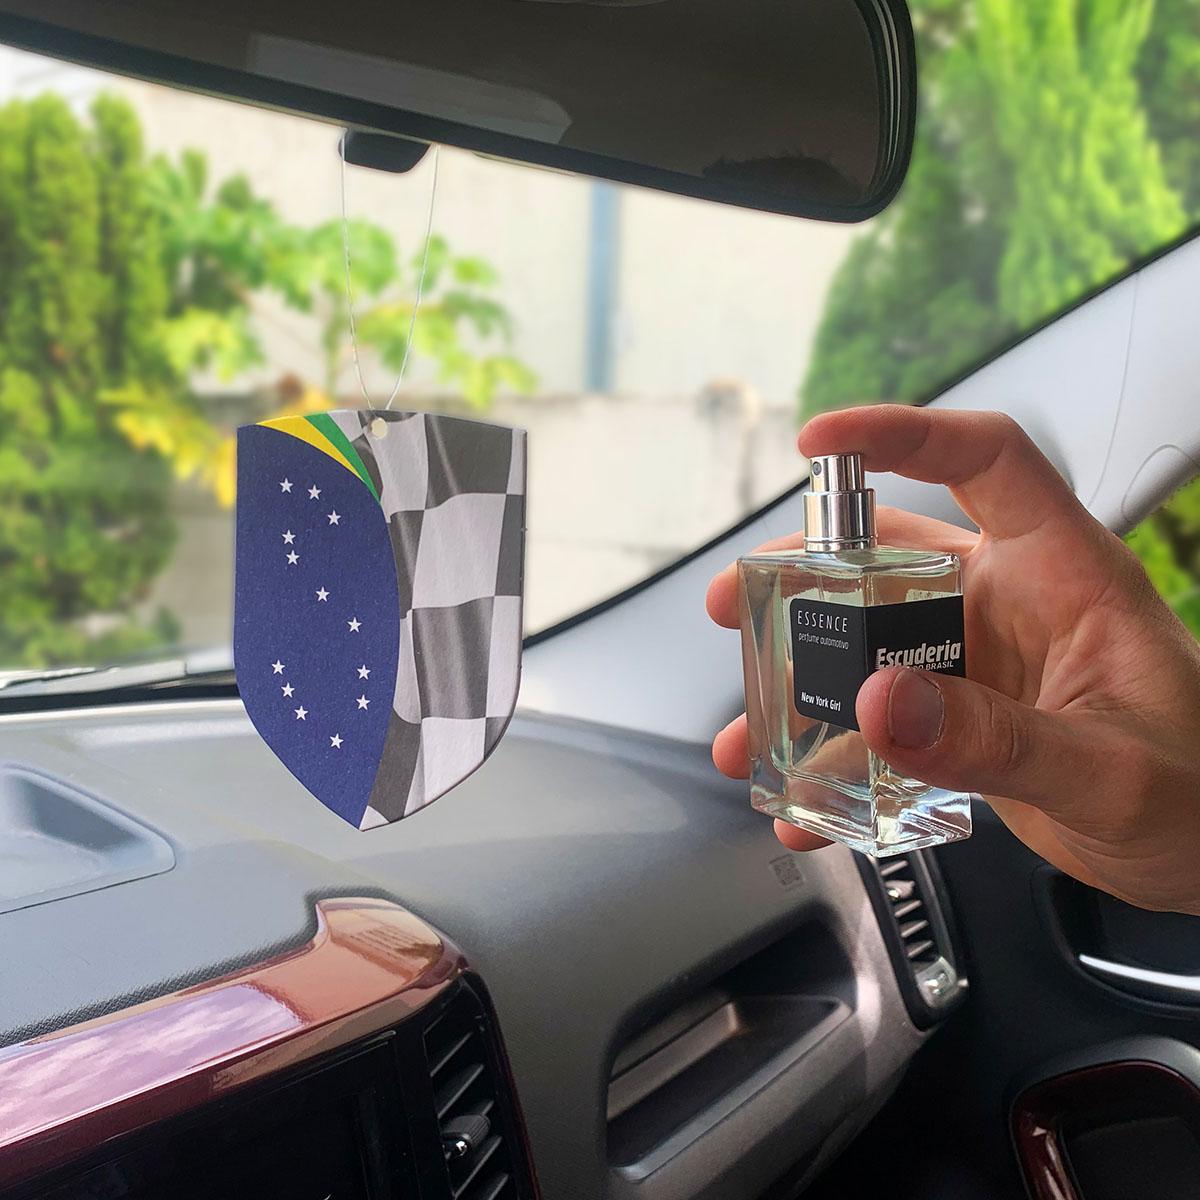 Perfume automotivo concentrado 50ml Super Million - Escuderia do Brasil